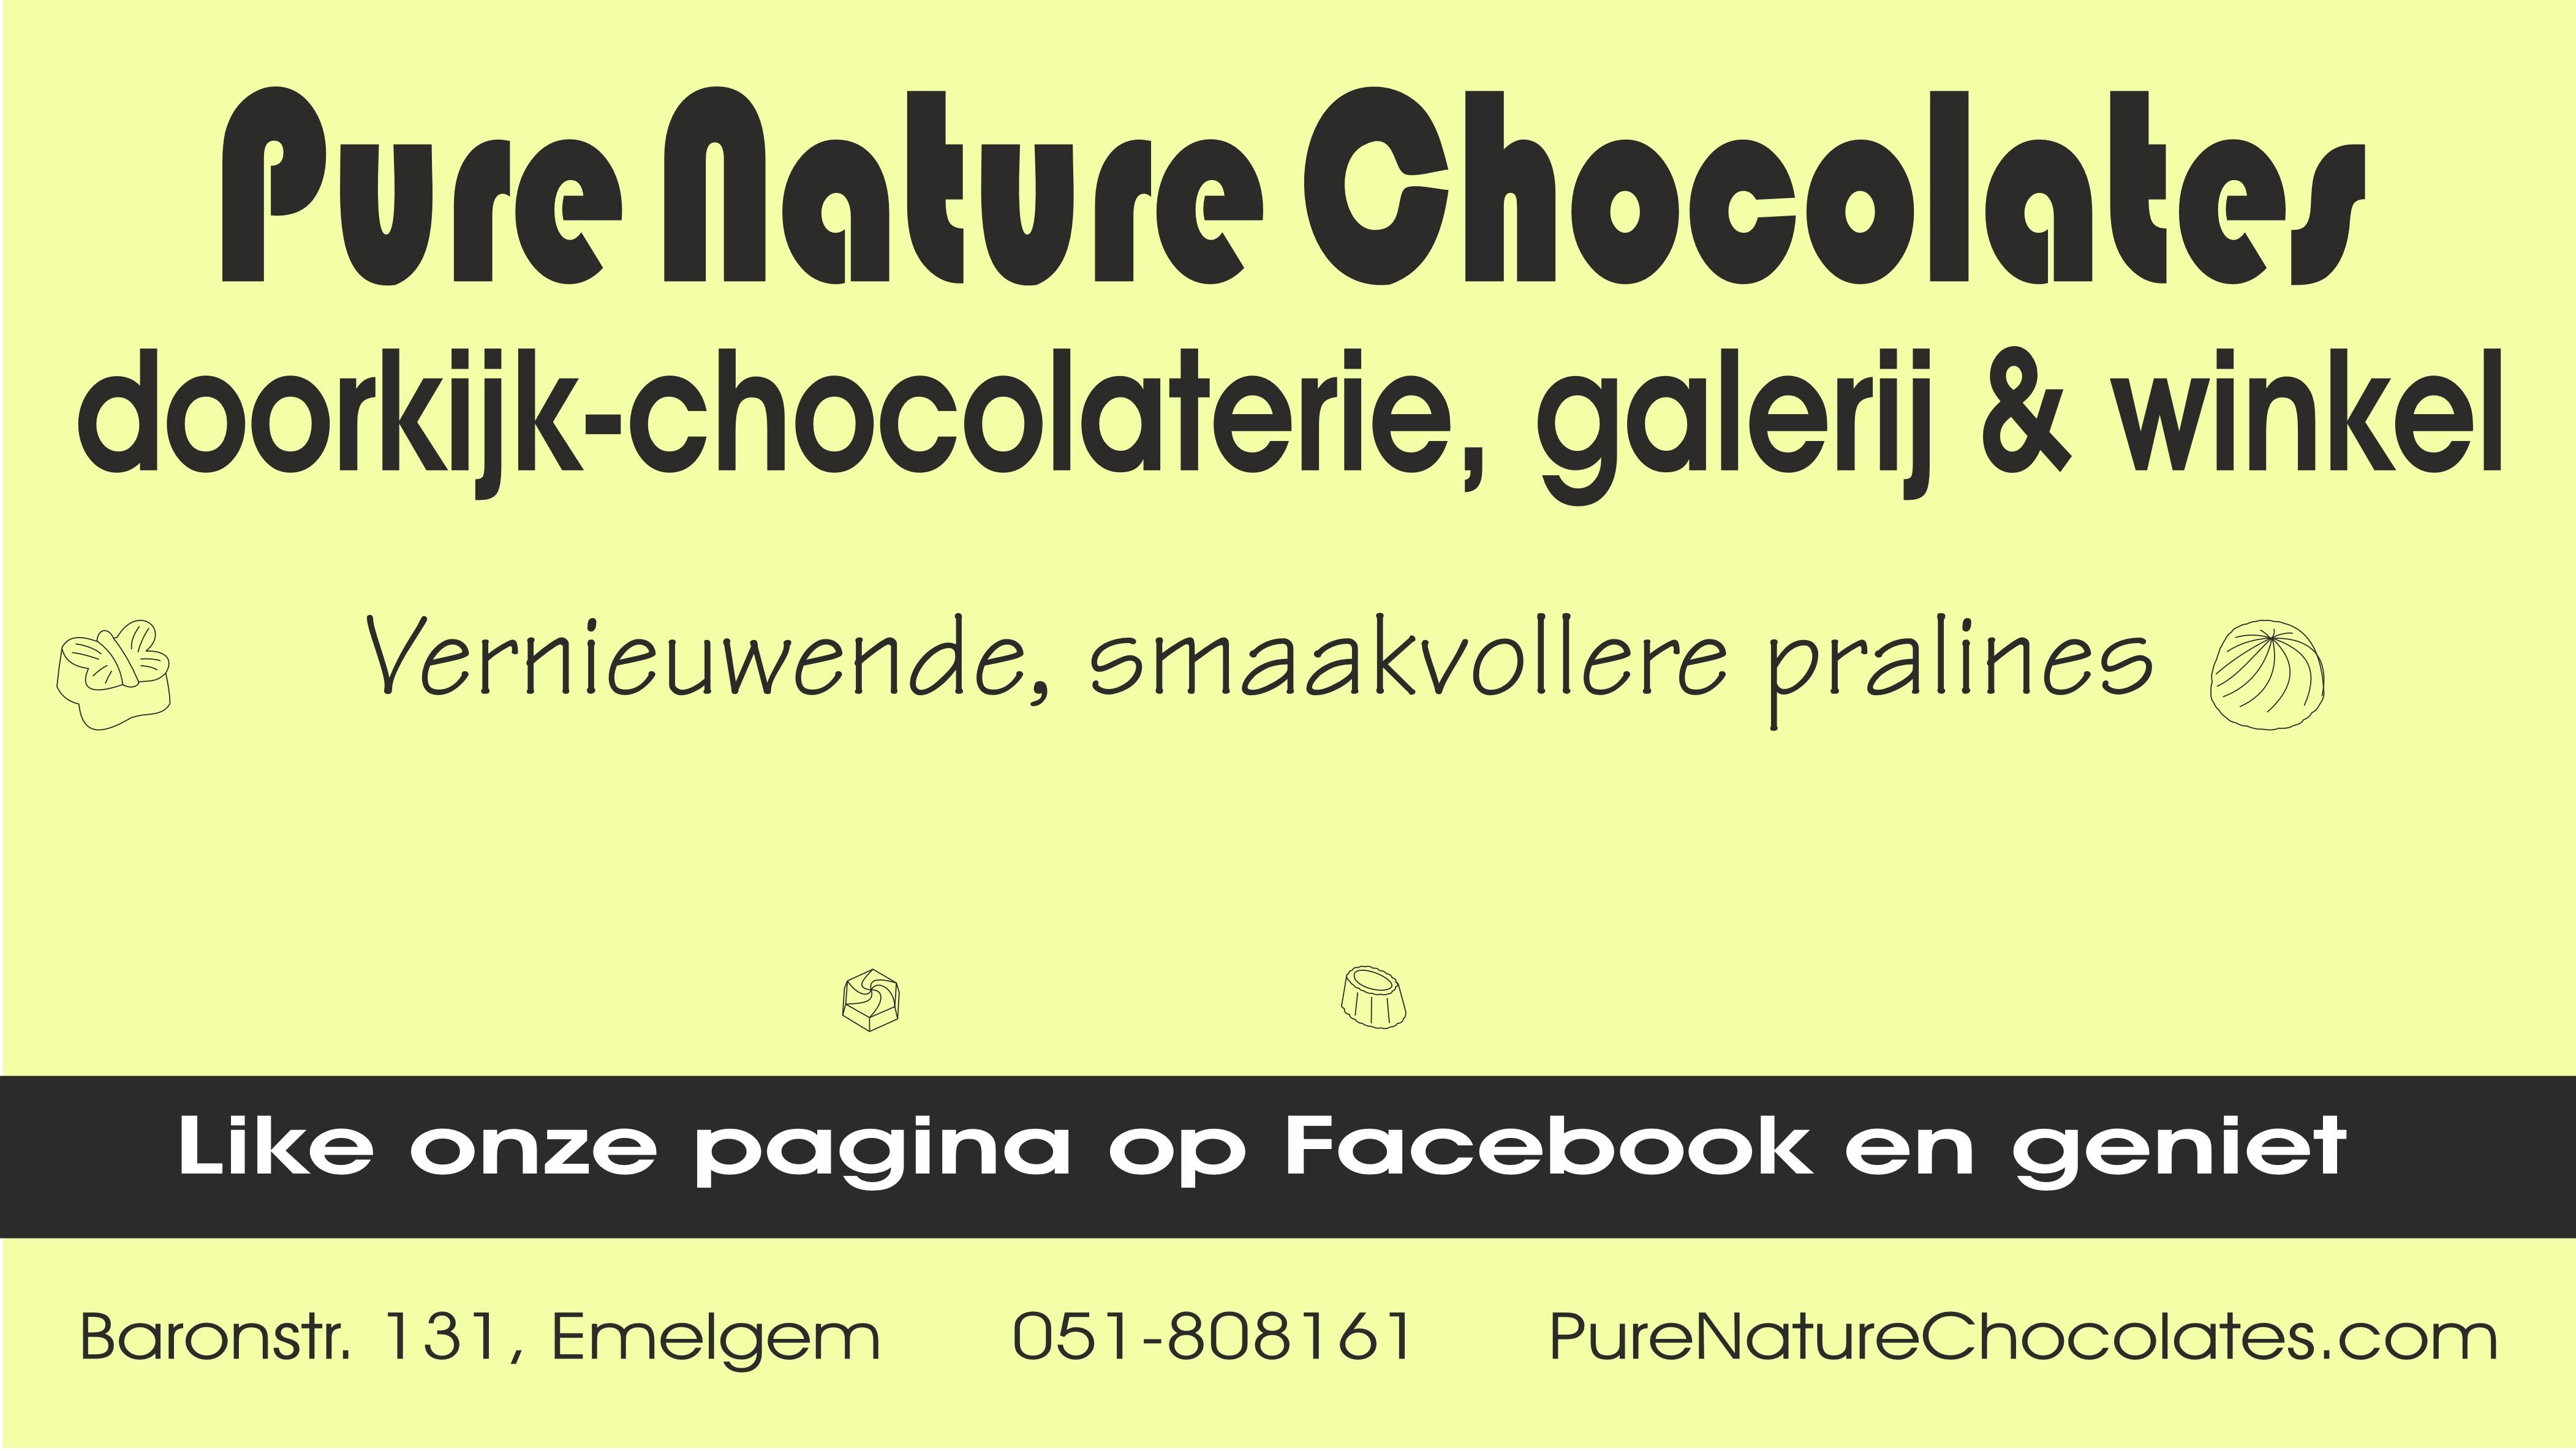 14-Monitor-purechocolates